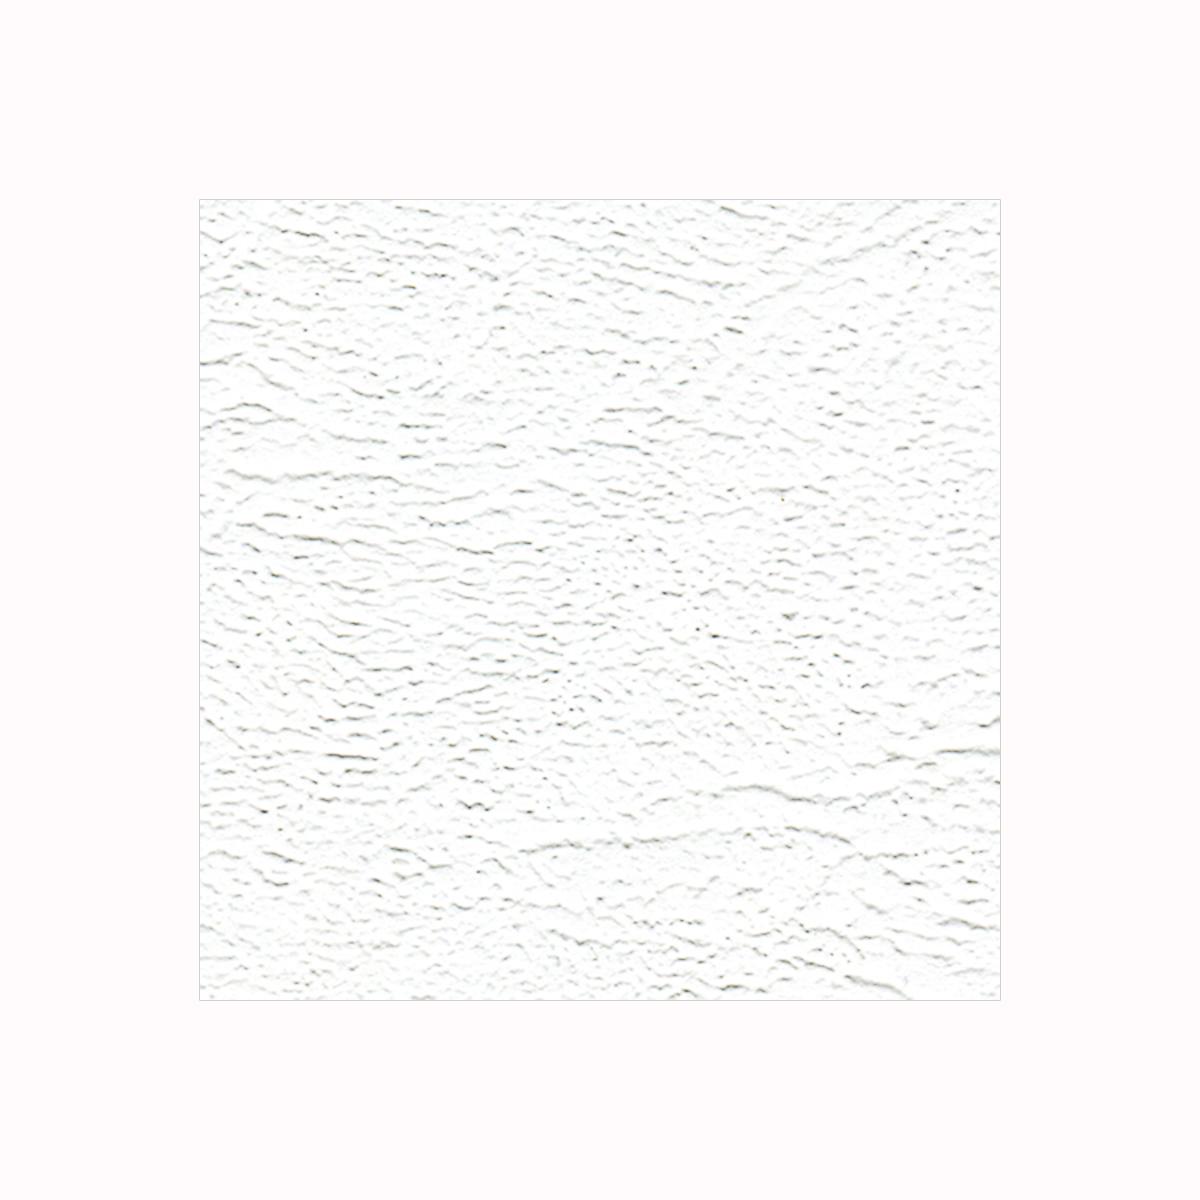 Бумага фактурная Лоза Кожа, цвет: белый, 3 листа. 582220582220